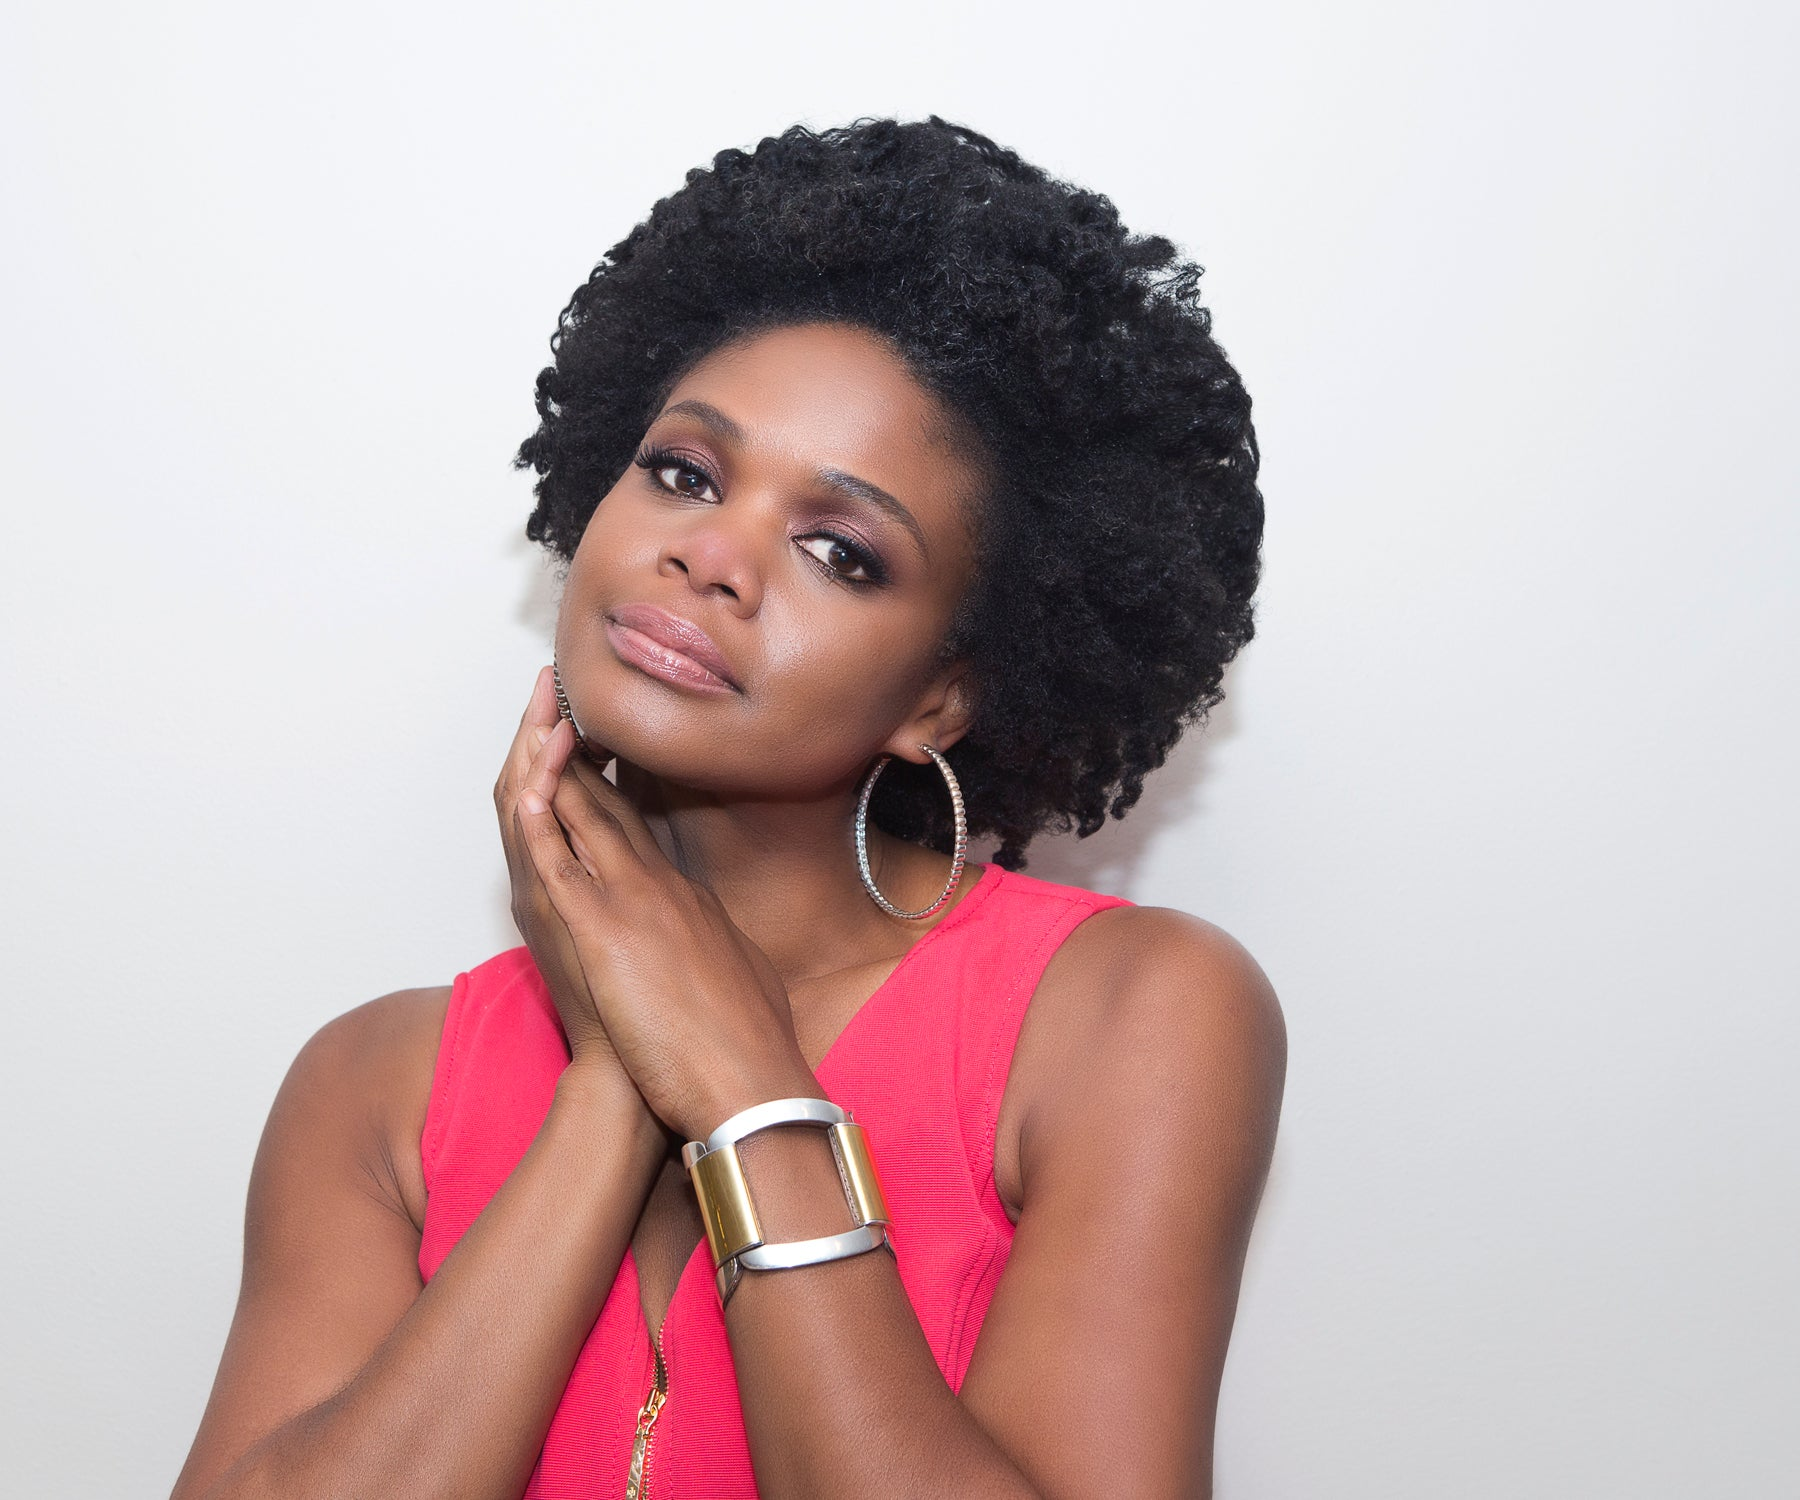 ESSENCE.com's Exclusive Celebrity Portraits Of 2014